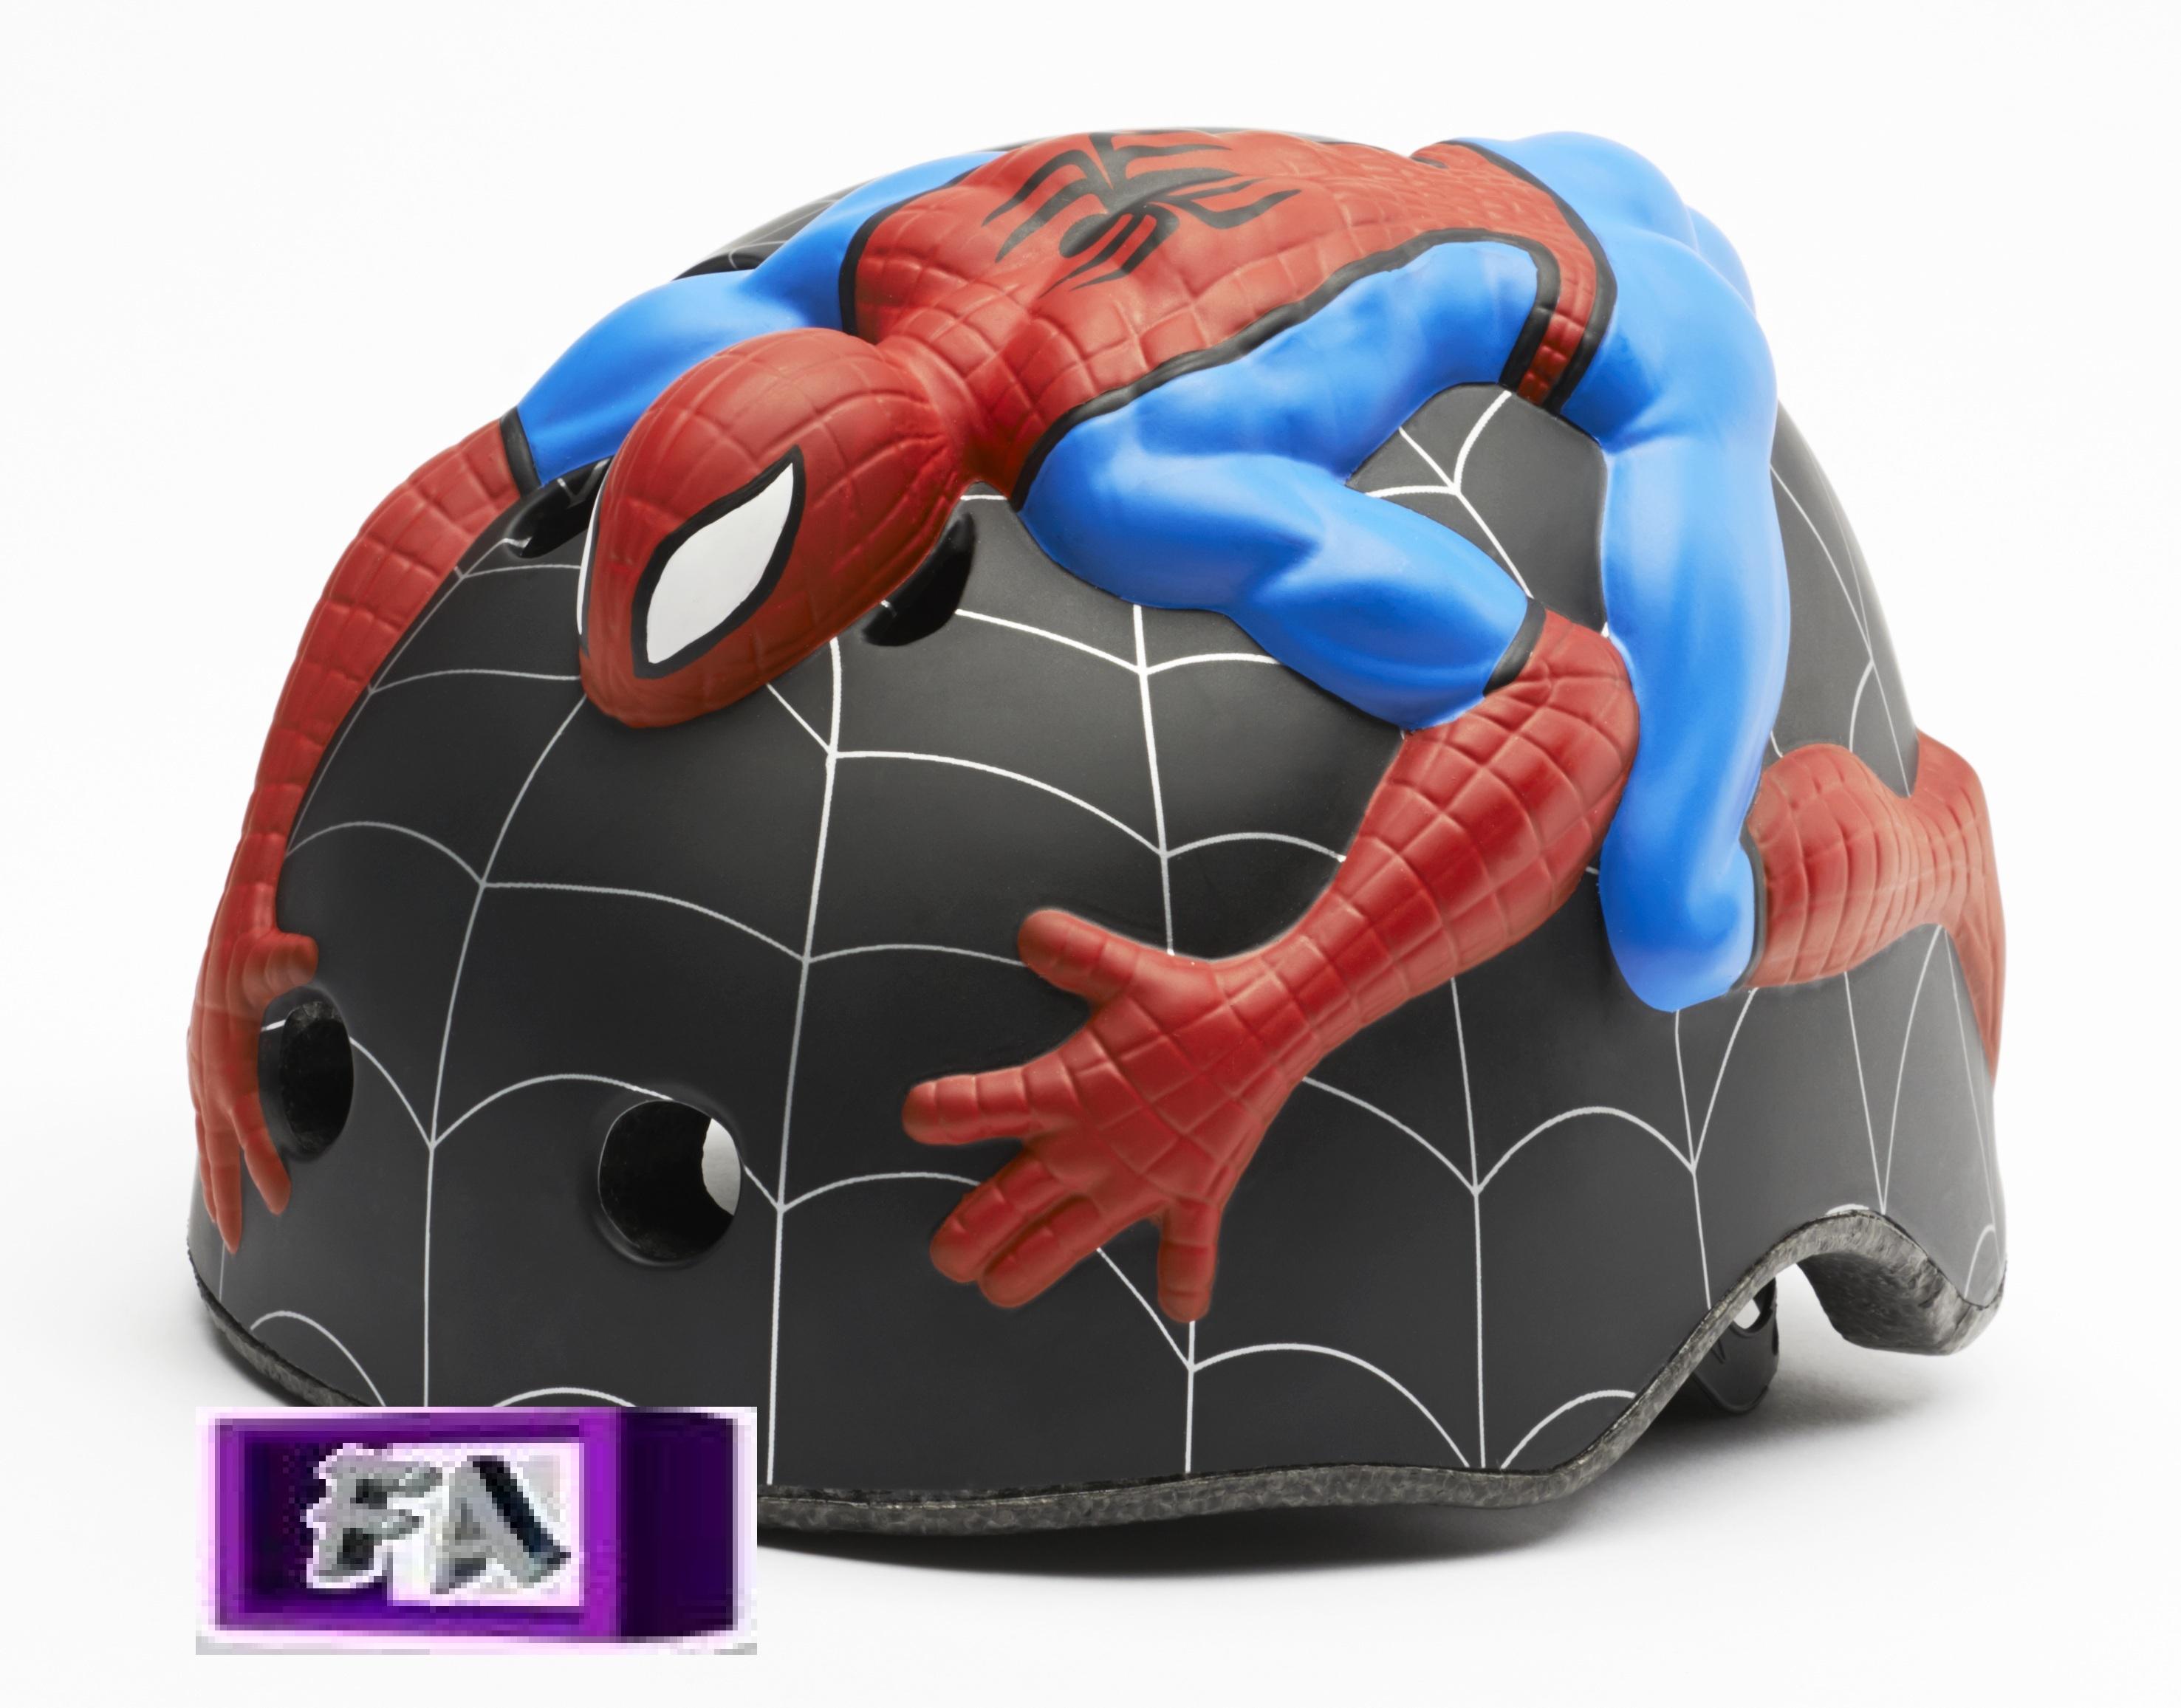 casque moto spiderman spider man motorcycle helmet hiconsumption radical custom spider man. Black Bedroom Furniture Sets. Home Design Ideas